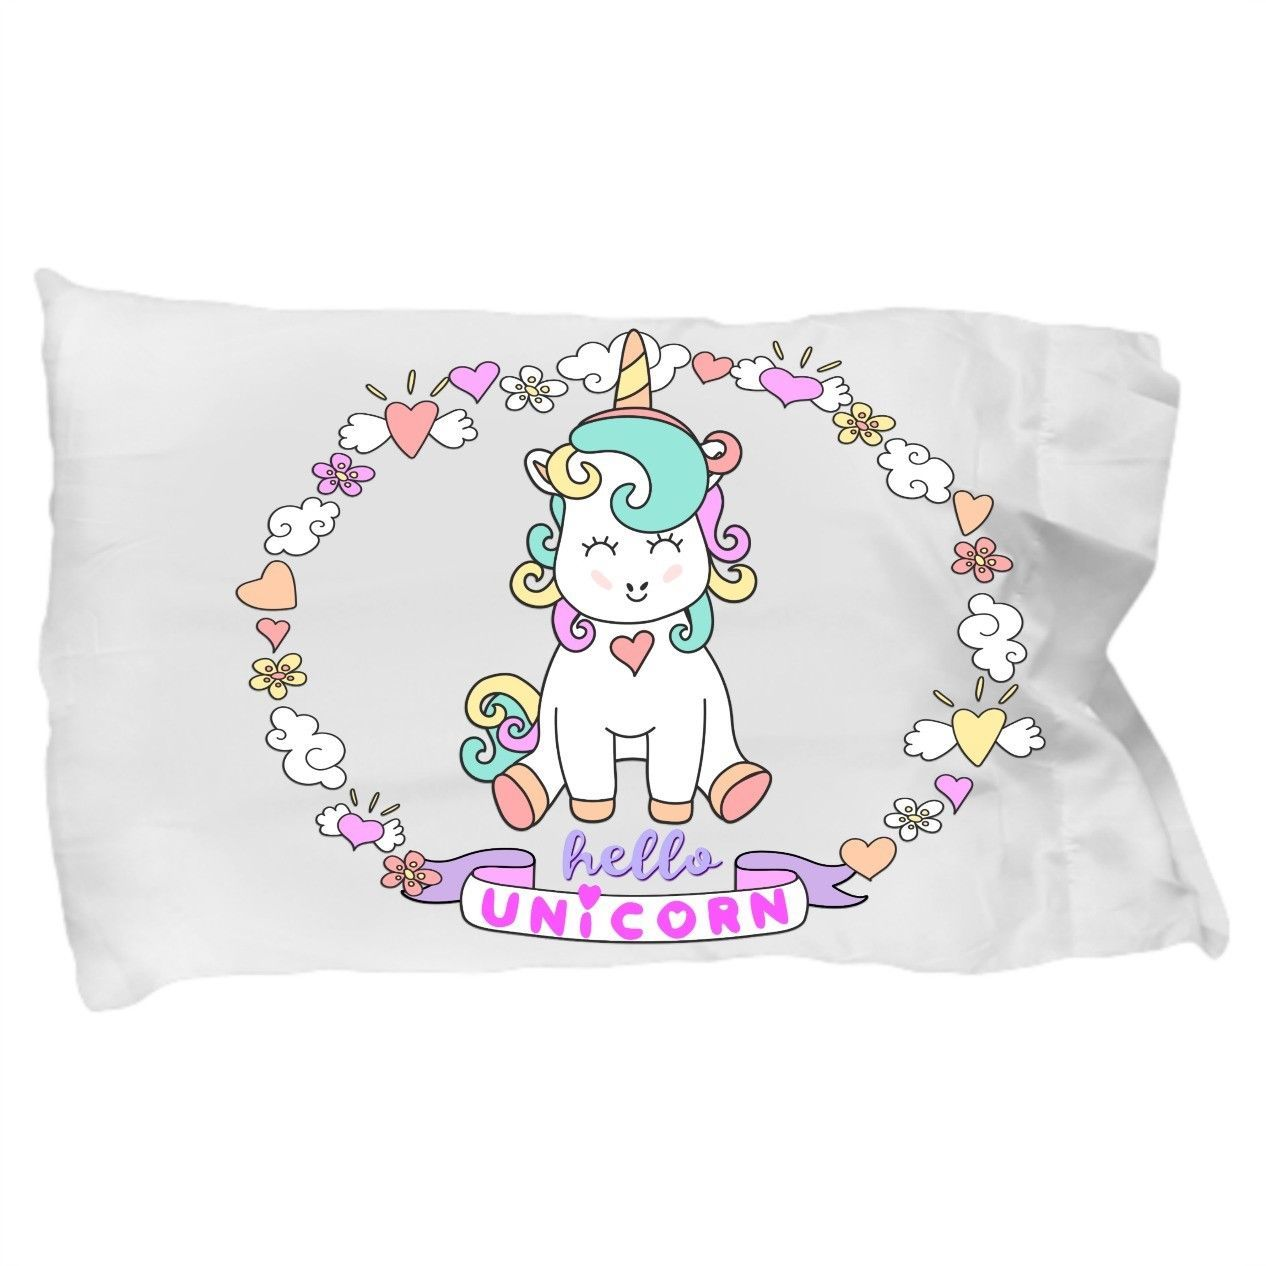 Unicorns Gift Bedding Pillowcase Hello Unicorn for Daughter Granddaughter Niece - $19.11